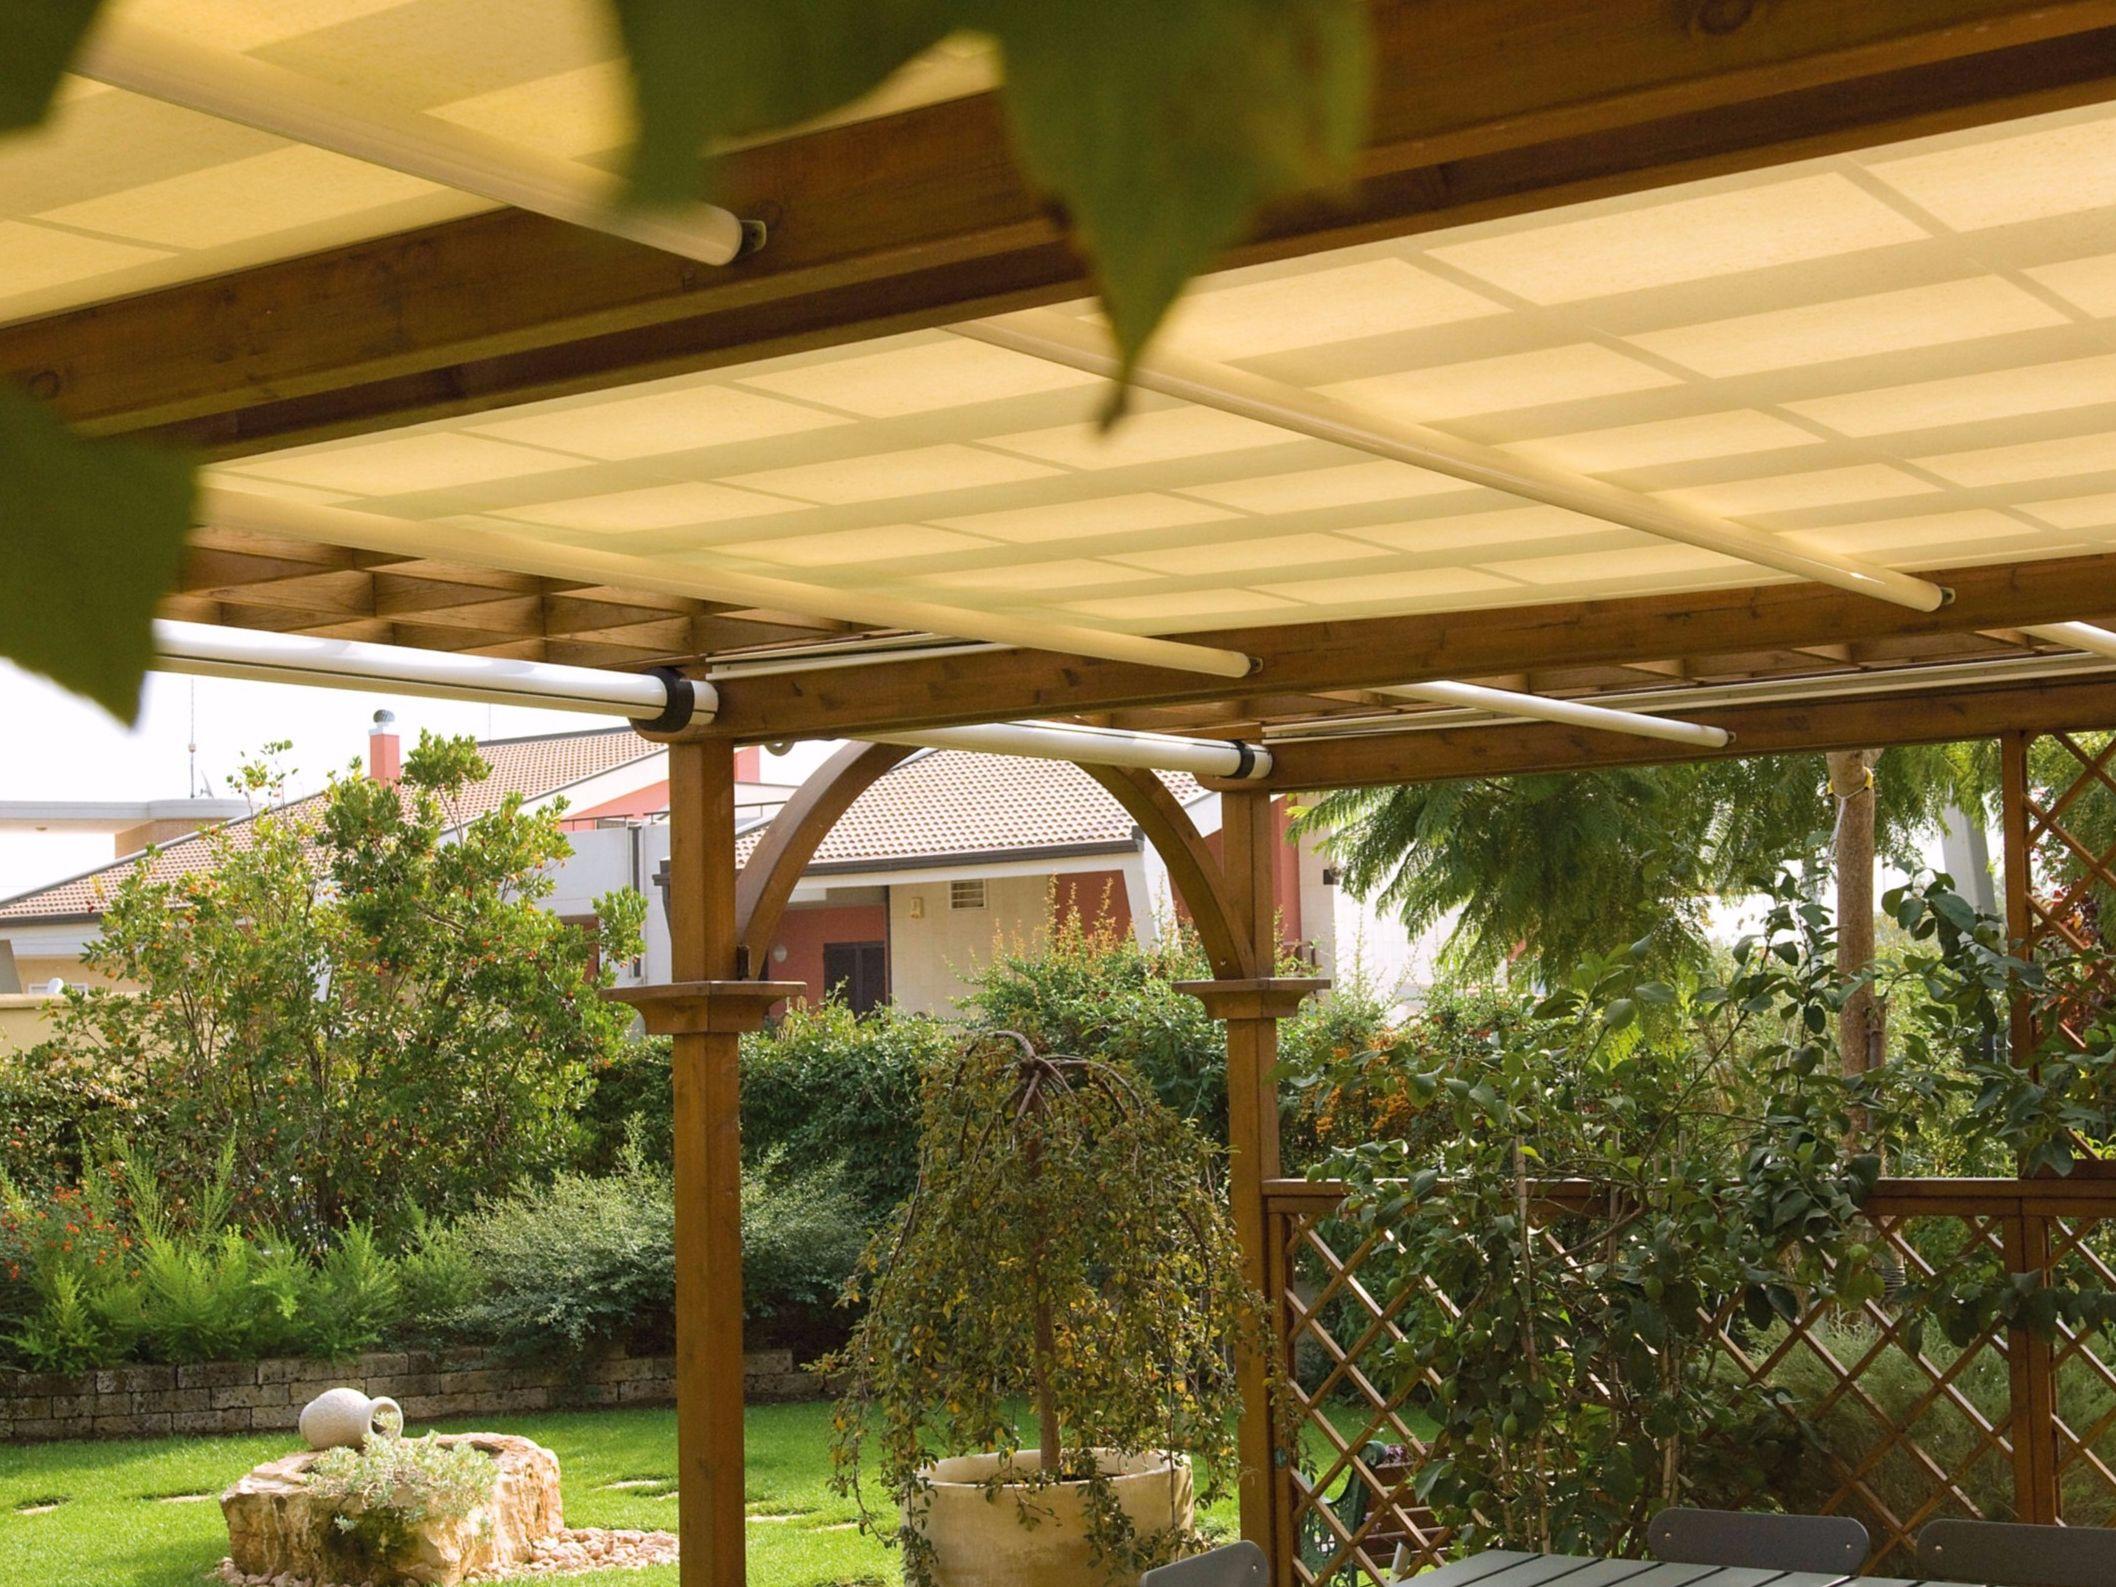 Tende Da Sole Patio : Terrassenüberdachung mit faltdach roll by frigerio tende da sole